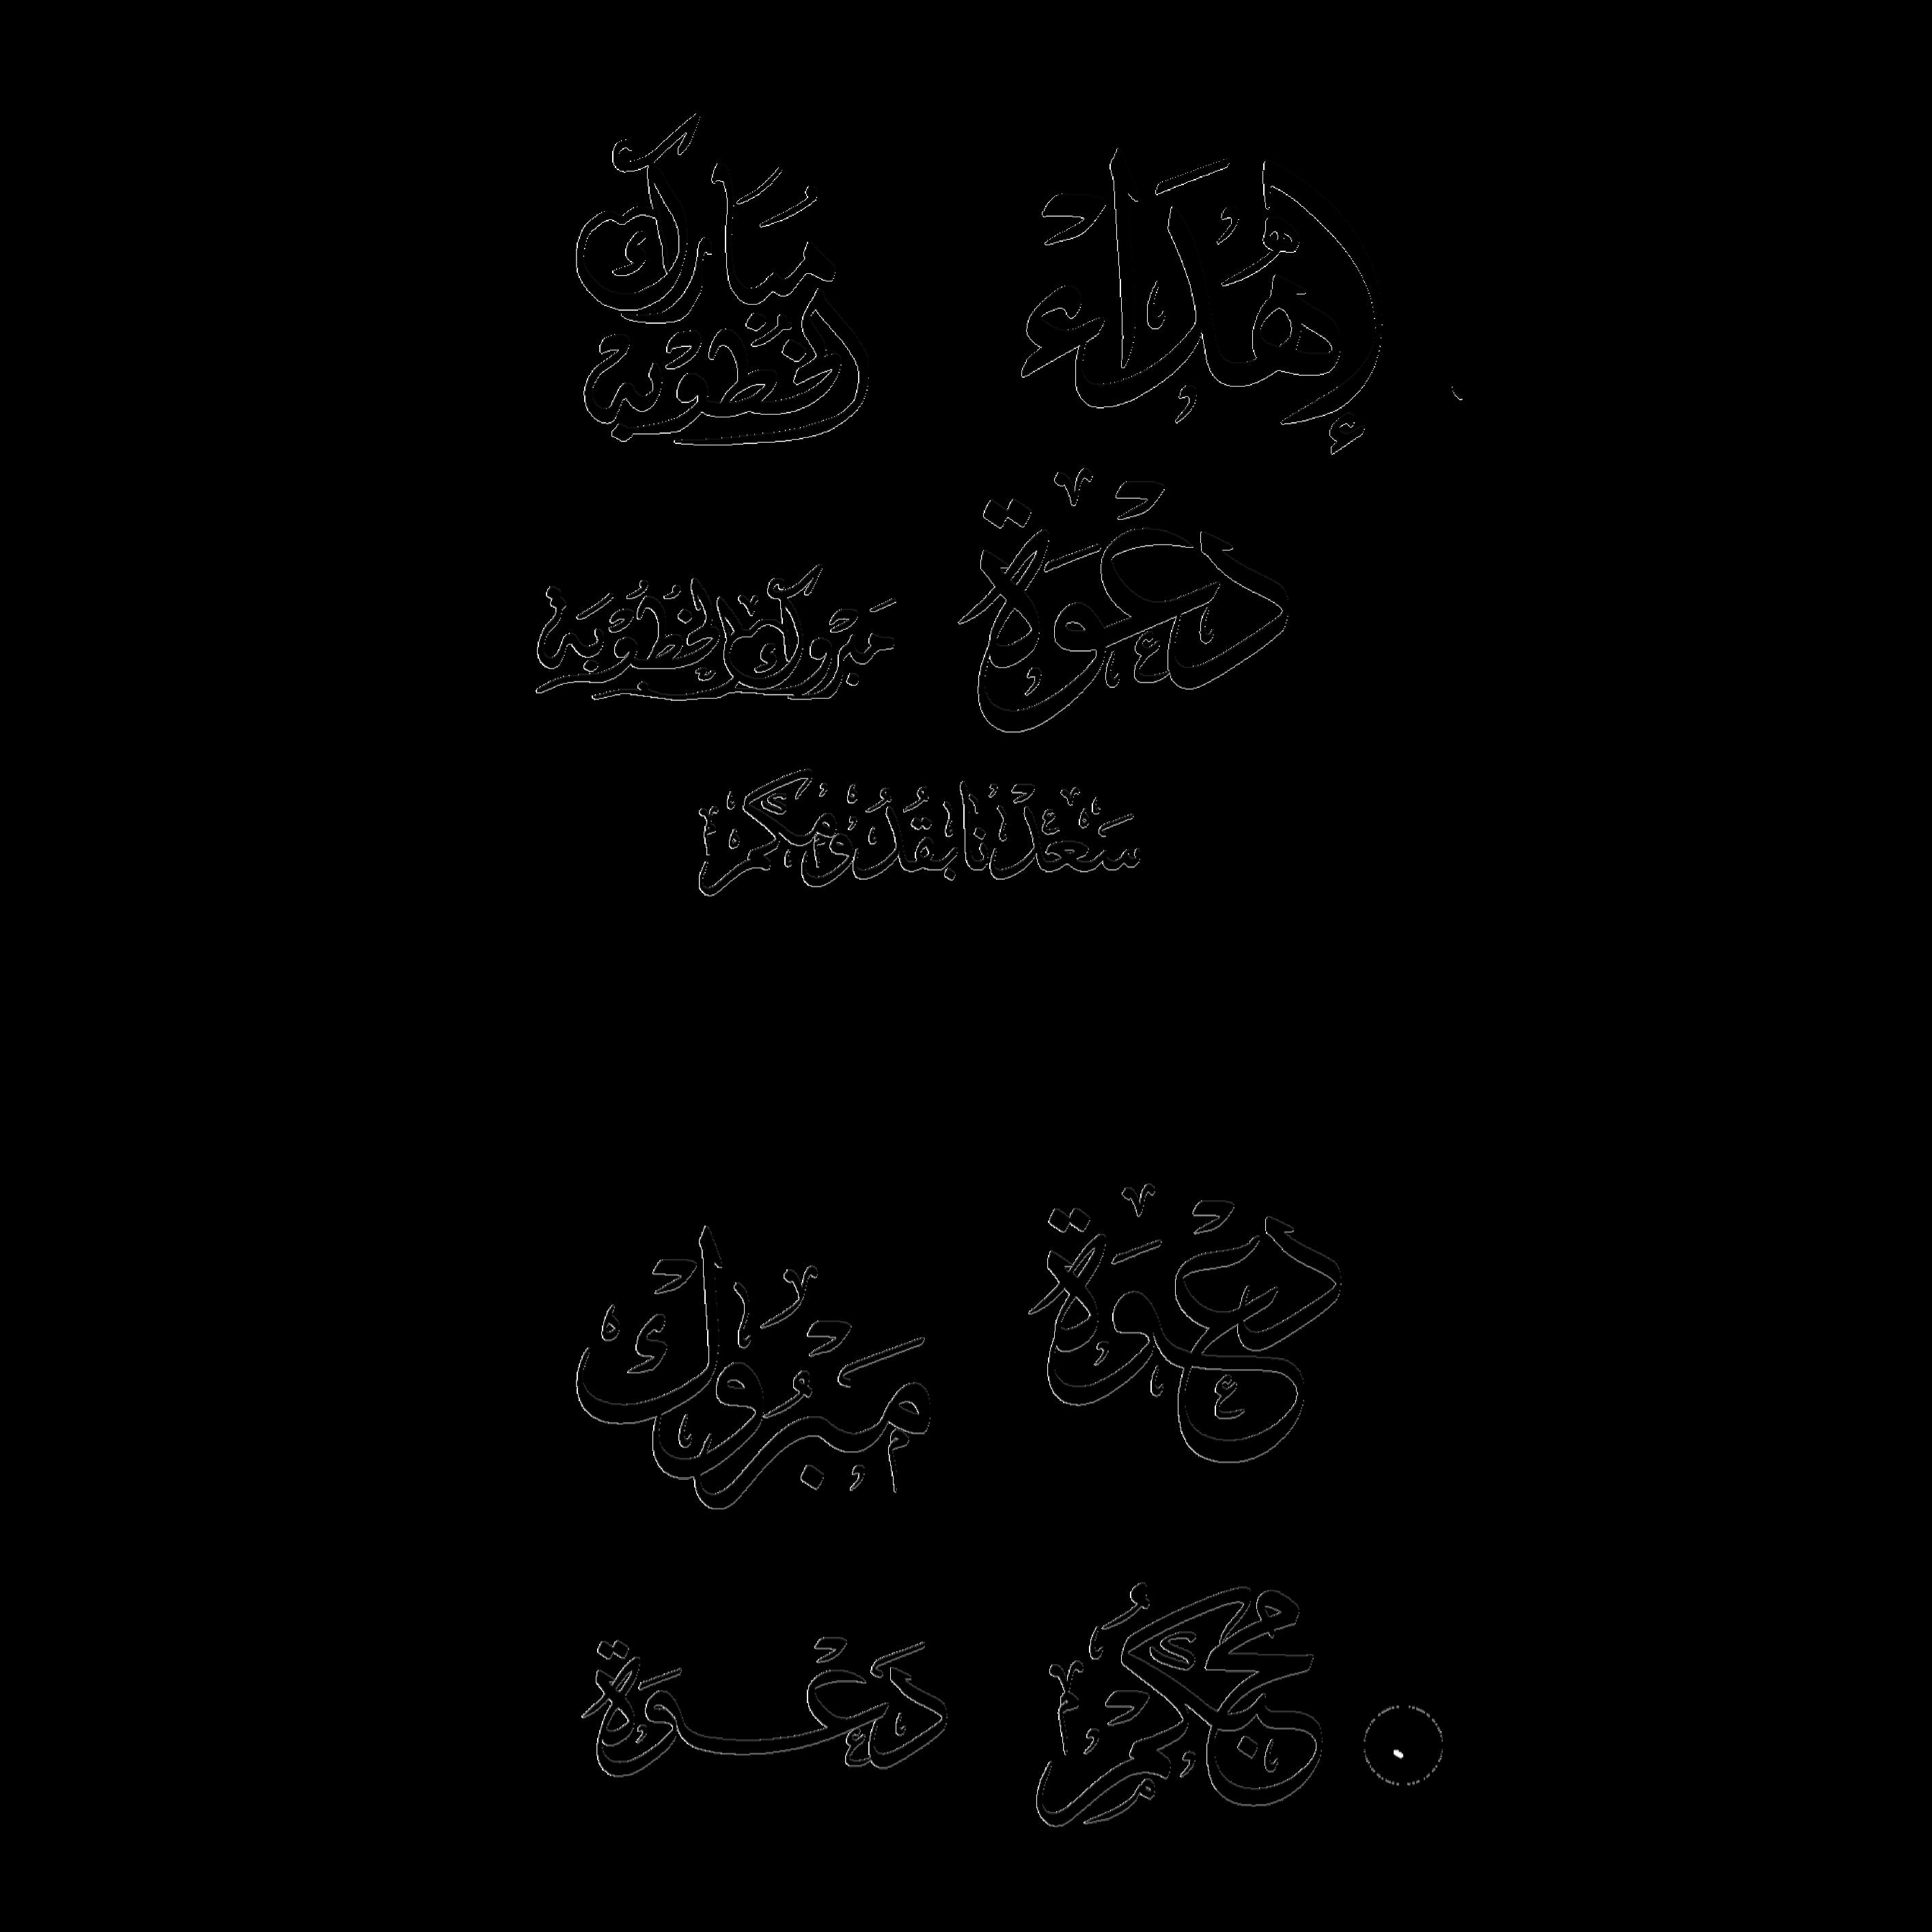 Freetoedit سناب فلاتر فلتر اهداء زواج فلتر زواج كلام خطوط ثيمات Collage Template Photo Collage Template Pop Art Design